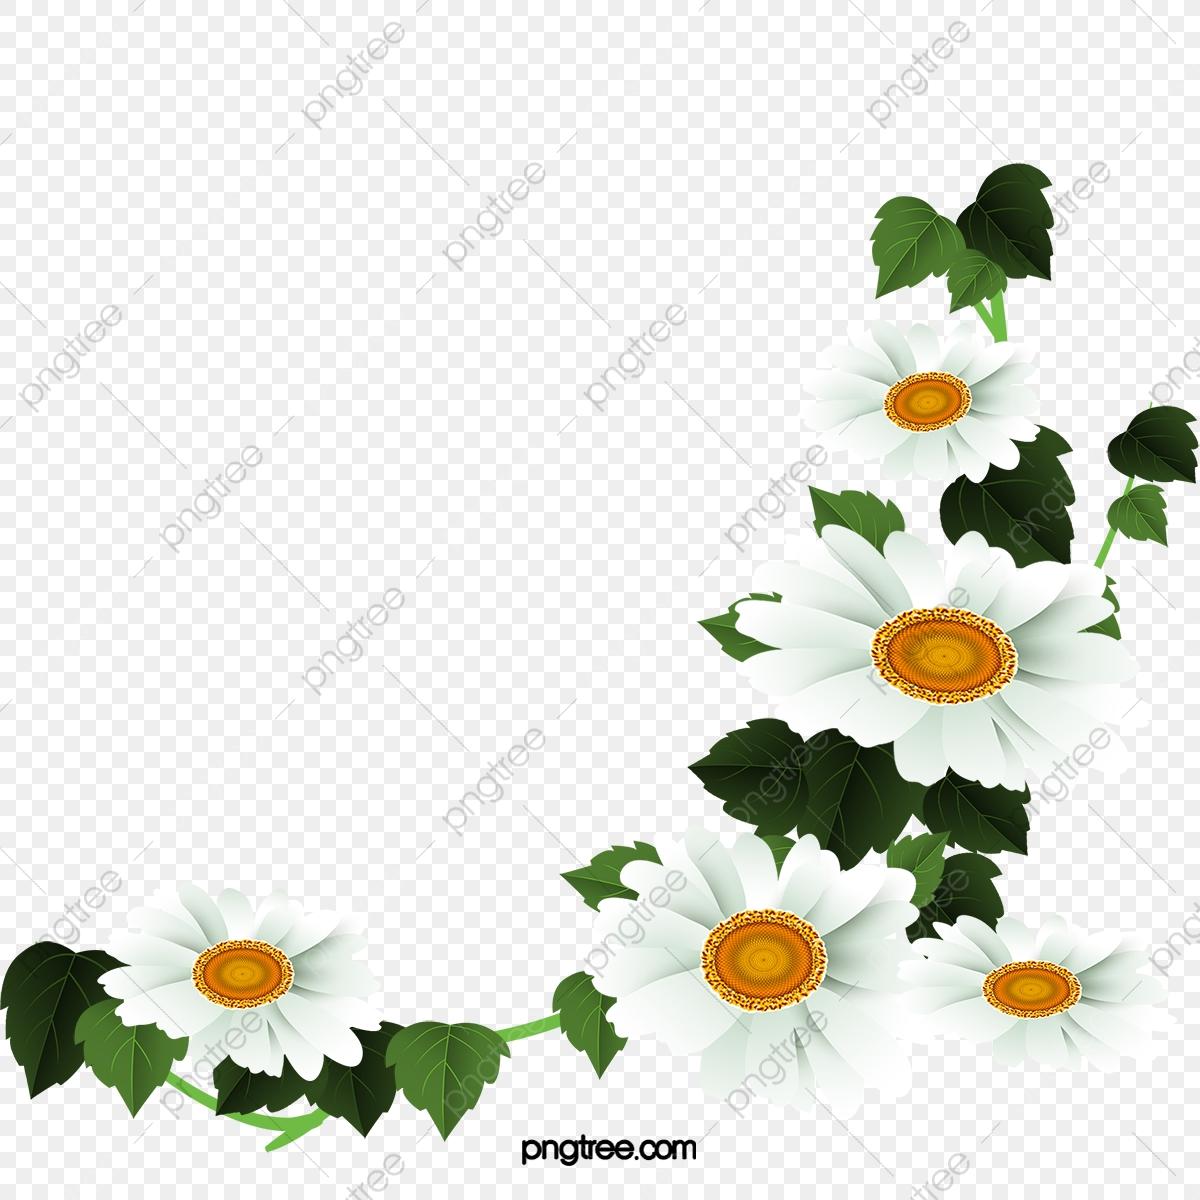 White Daisy Flower Decoration Pattern, Daisy Clipart, Flower Clipart.